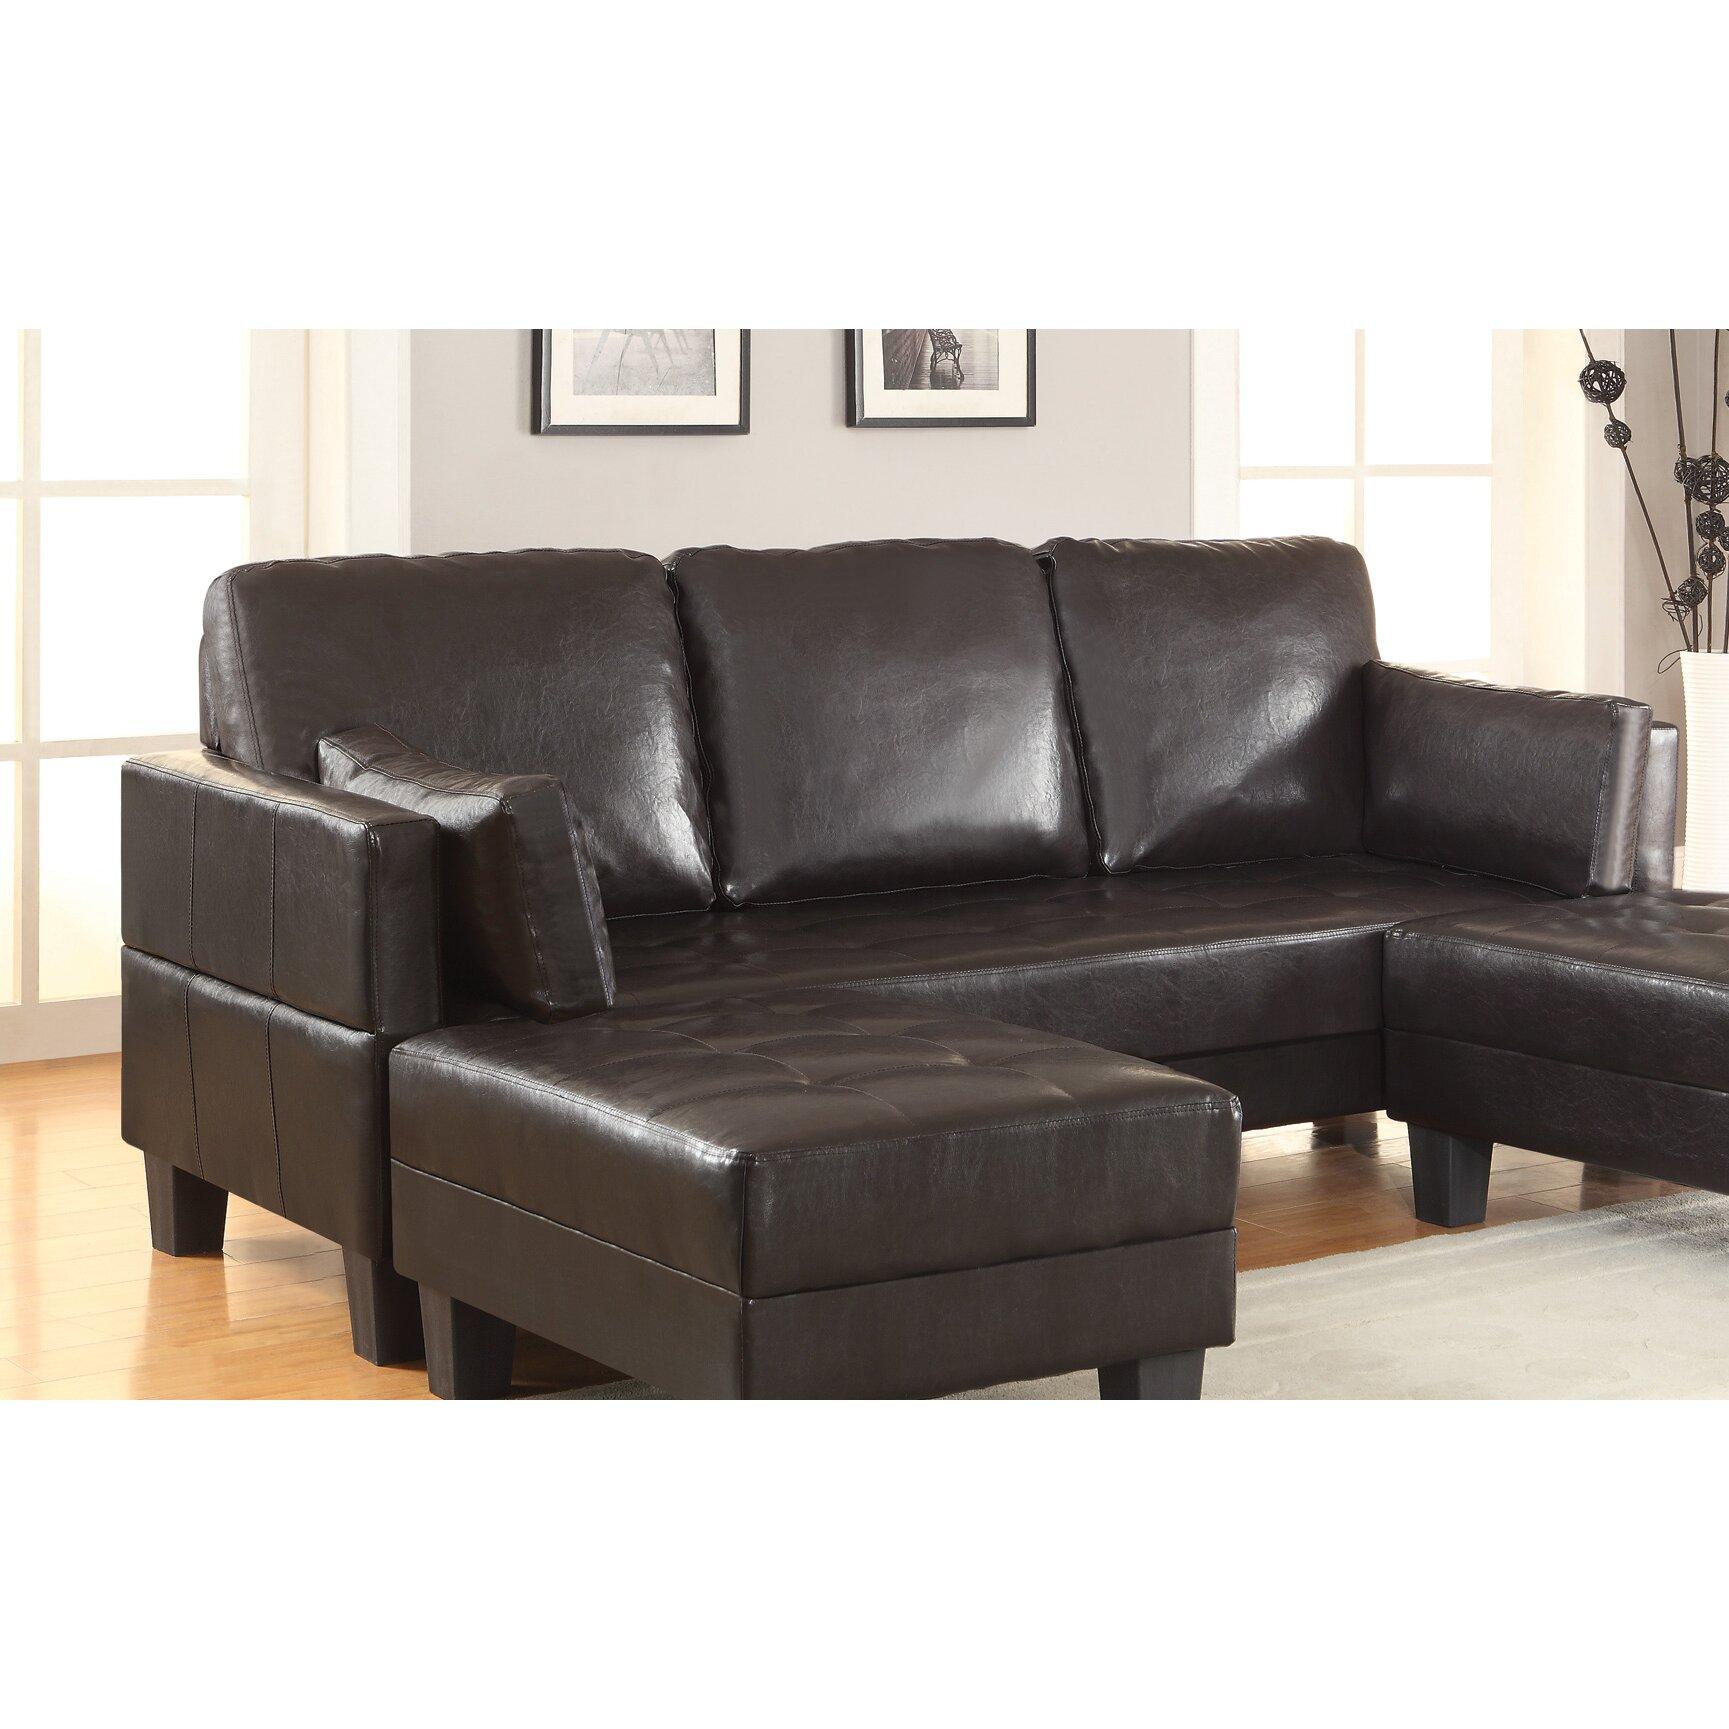 Wayfair Sleeper Sofa Replacement Legs